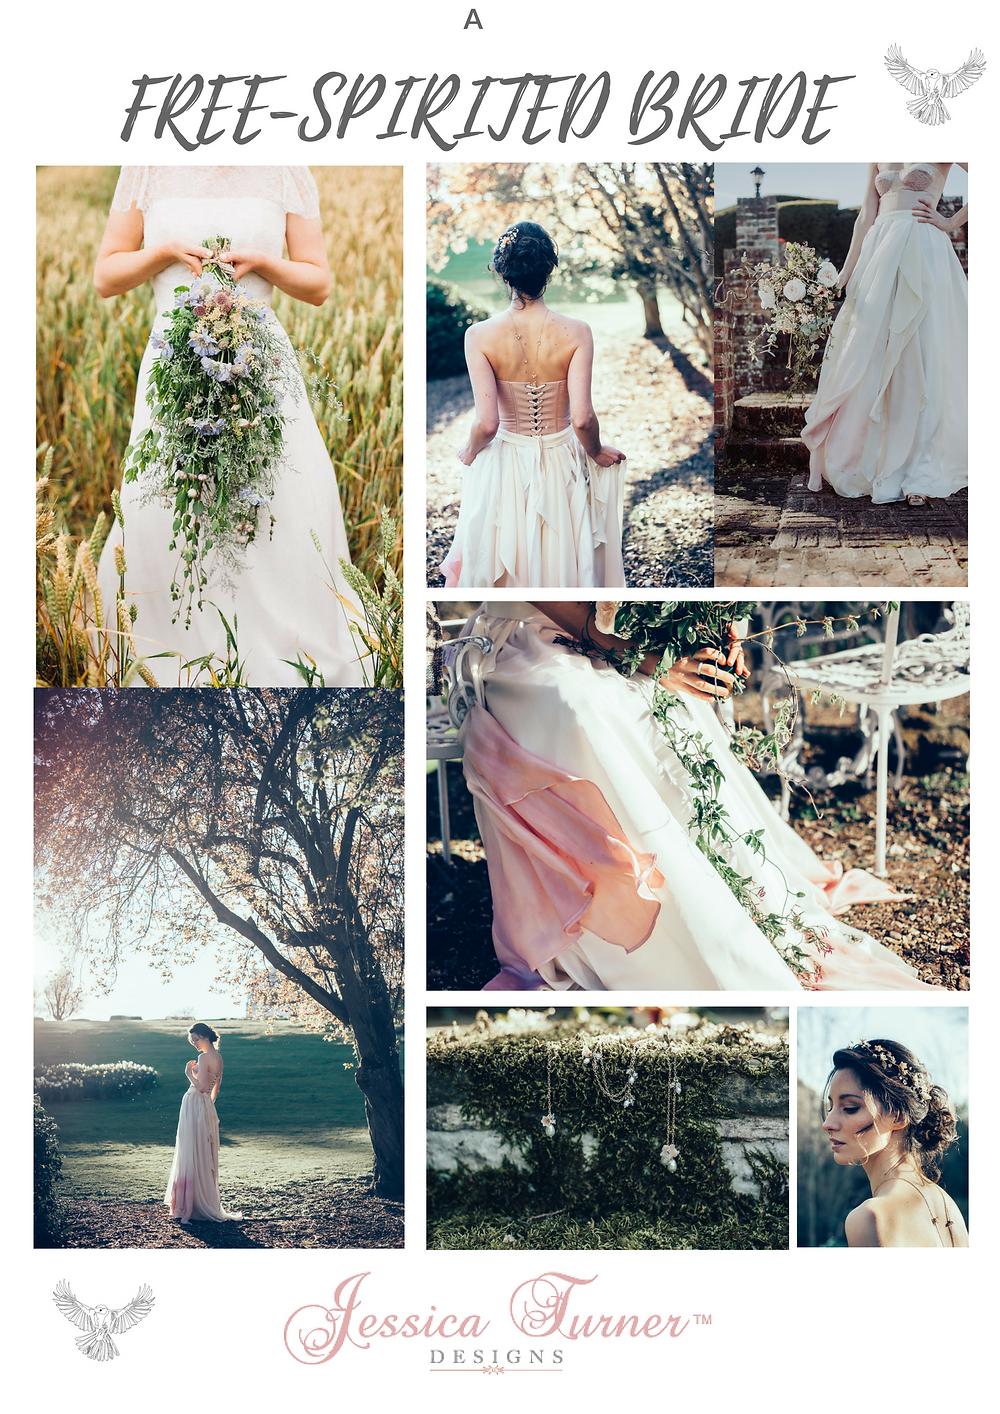 A free spirited bride by Jessica Turner Designs